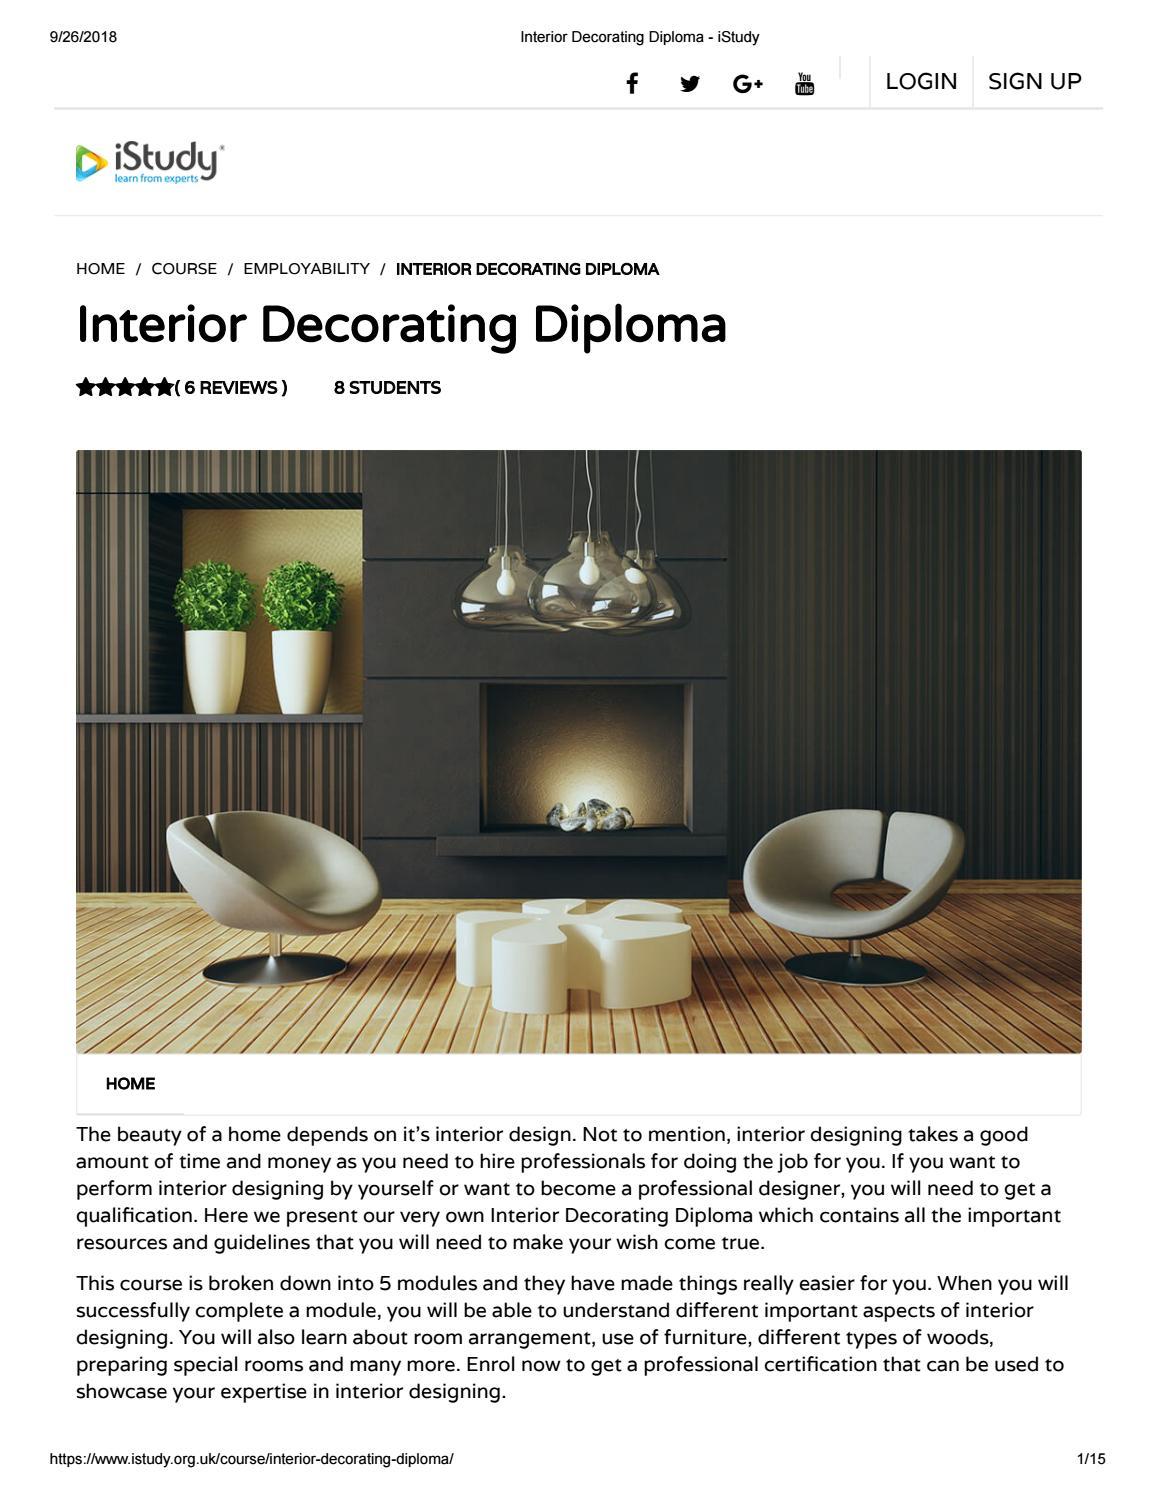 Interior Decorating Diploma Istudy By Istudyorguk Issuu